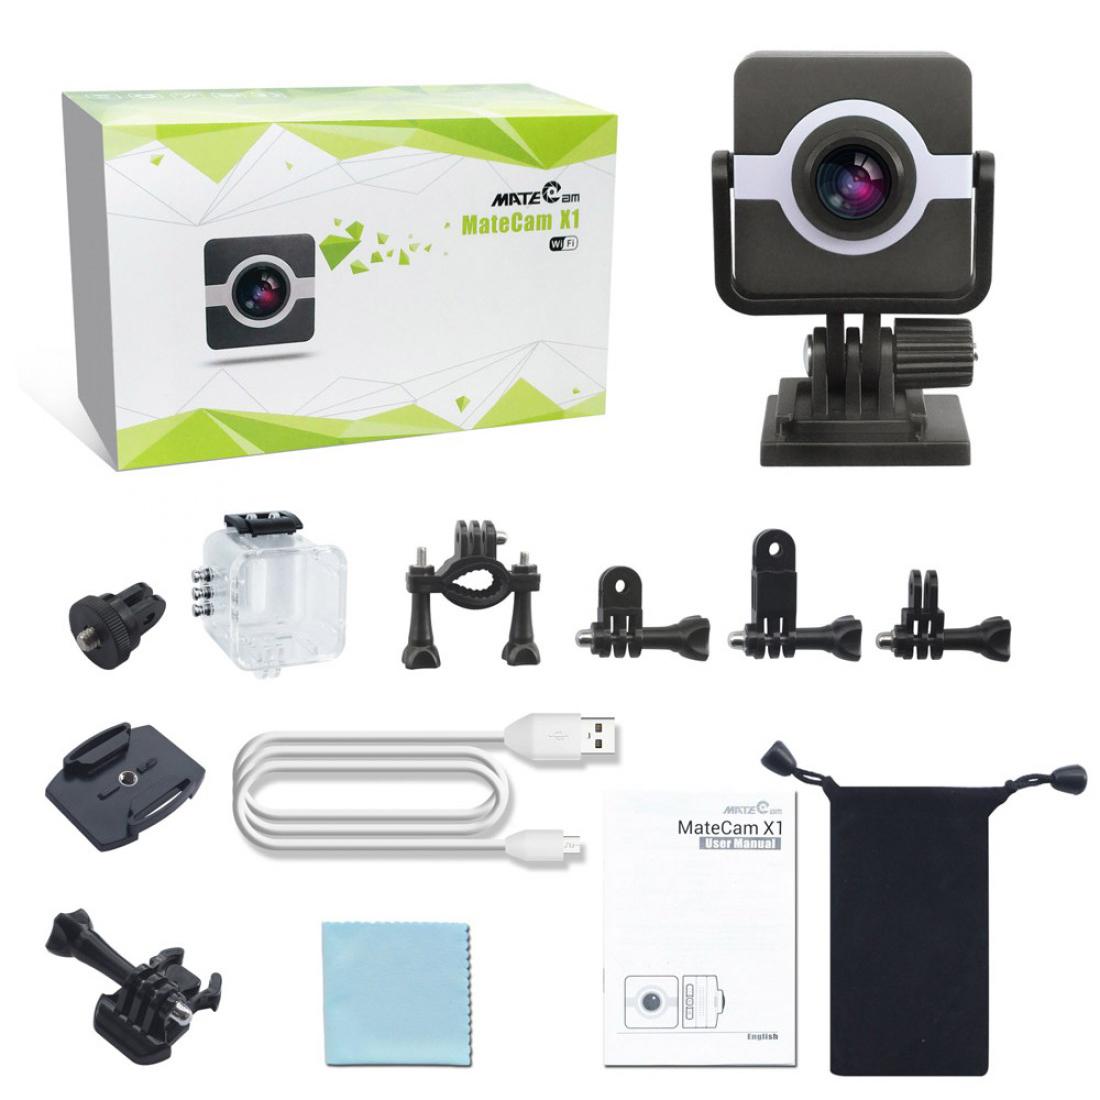 Matecam X1 4K Action Camera WIFI Sports Camera Ultra HD Waterproof Mini DV Camcorder Video Recorder Action Cam (5)